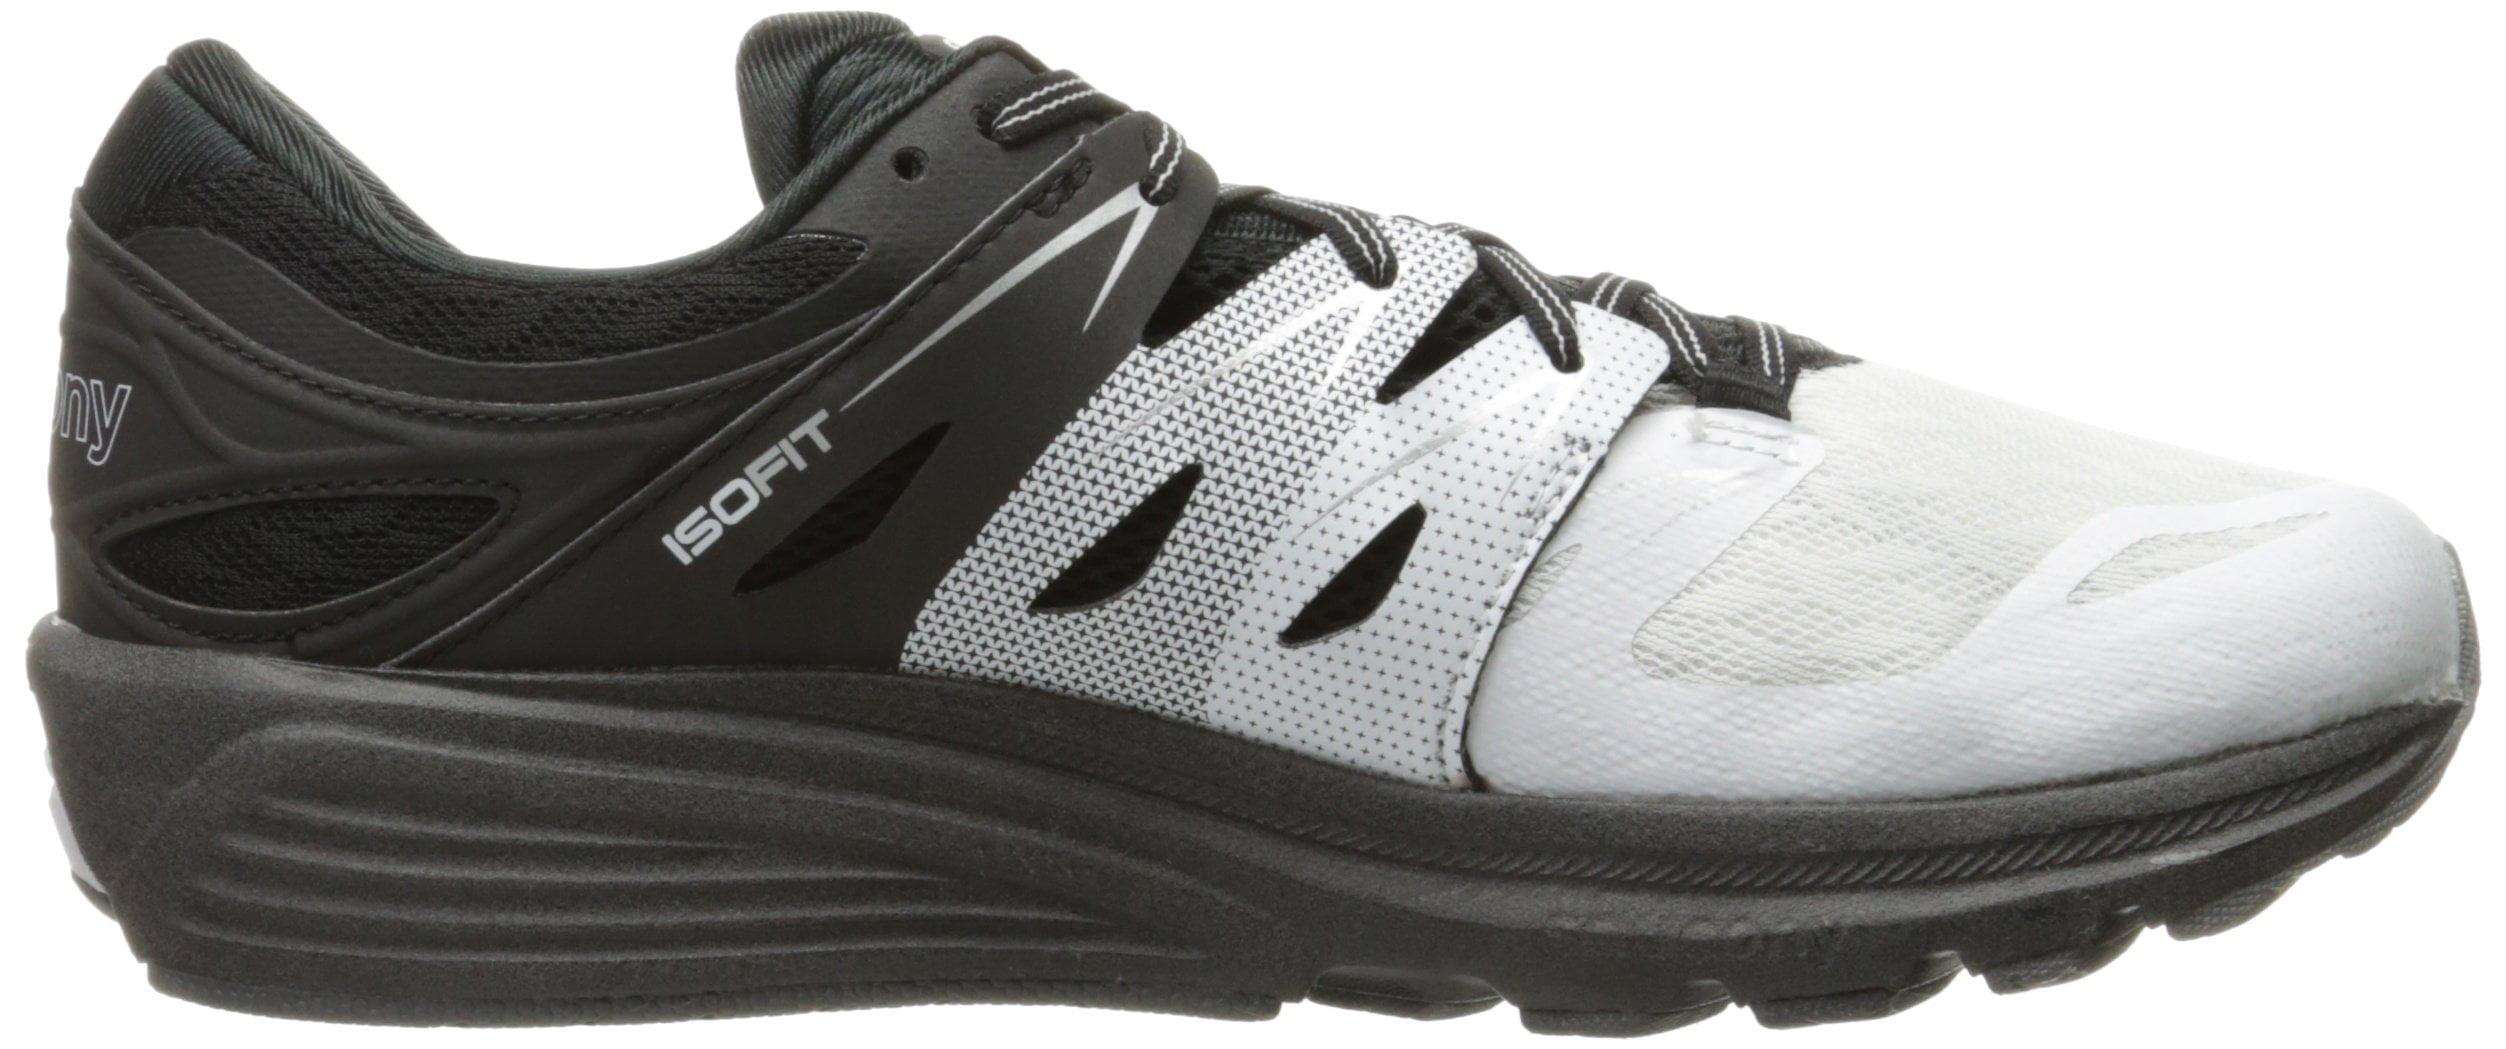 3807e69f Mens Saucony Zealot ISO 2 Reflex White Black Silver S20332-1